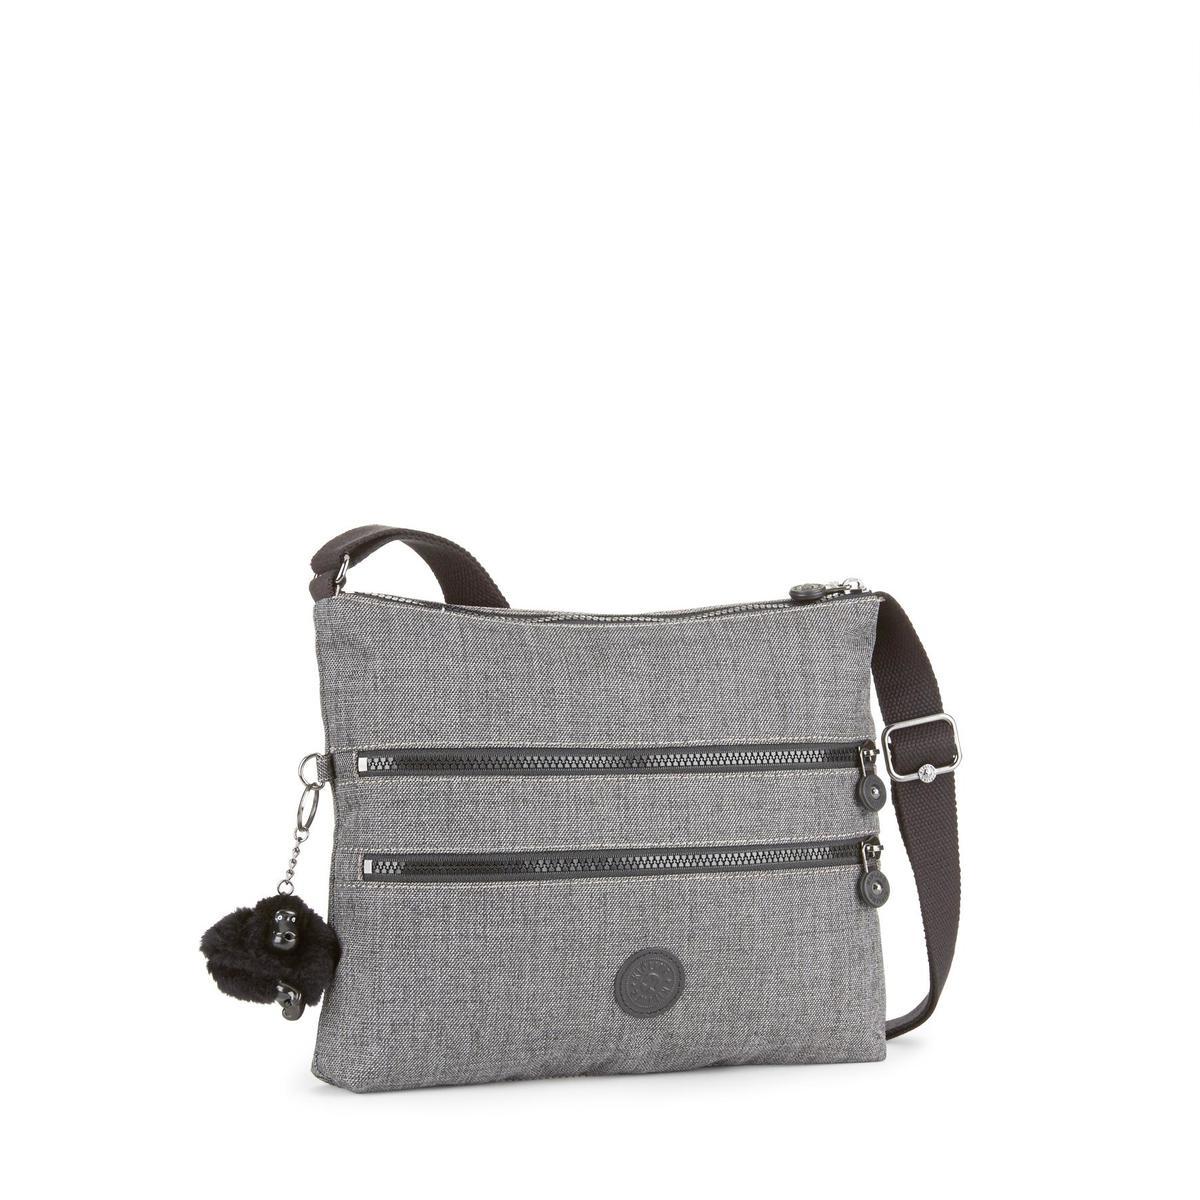 84c6ac1c34 Kipling Bags ALVAR Grey multi handbag | Kipling Outlet